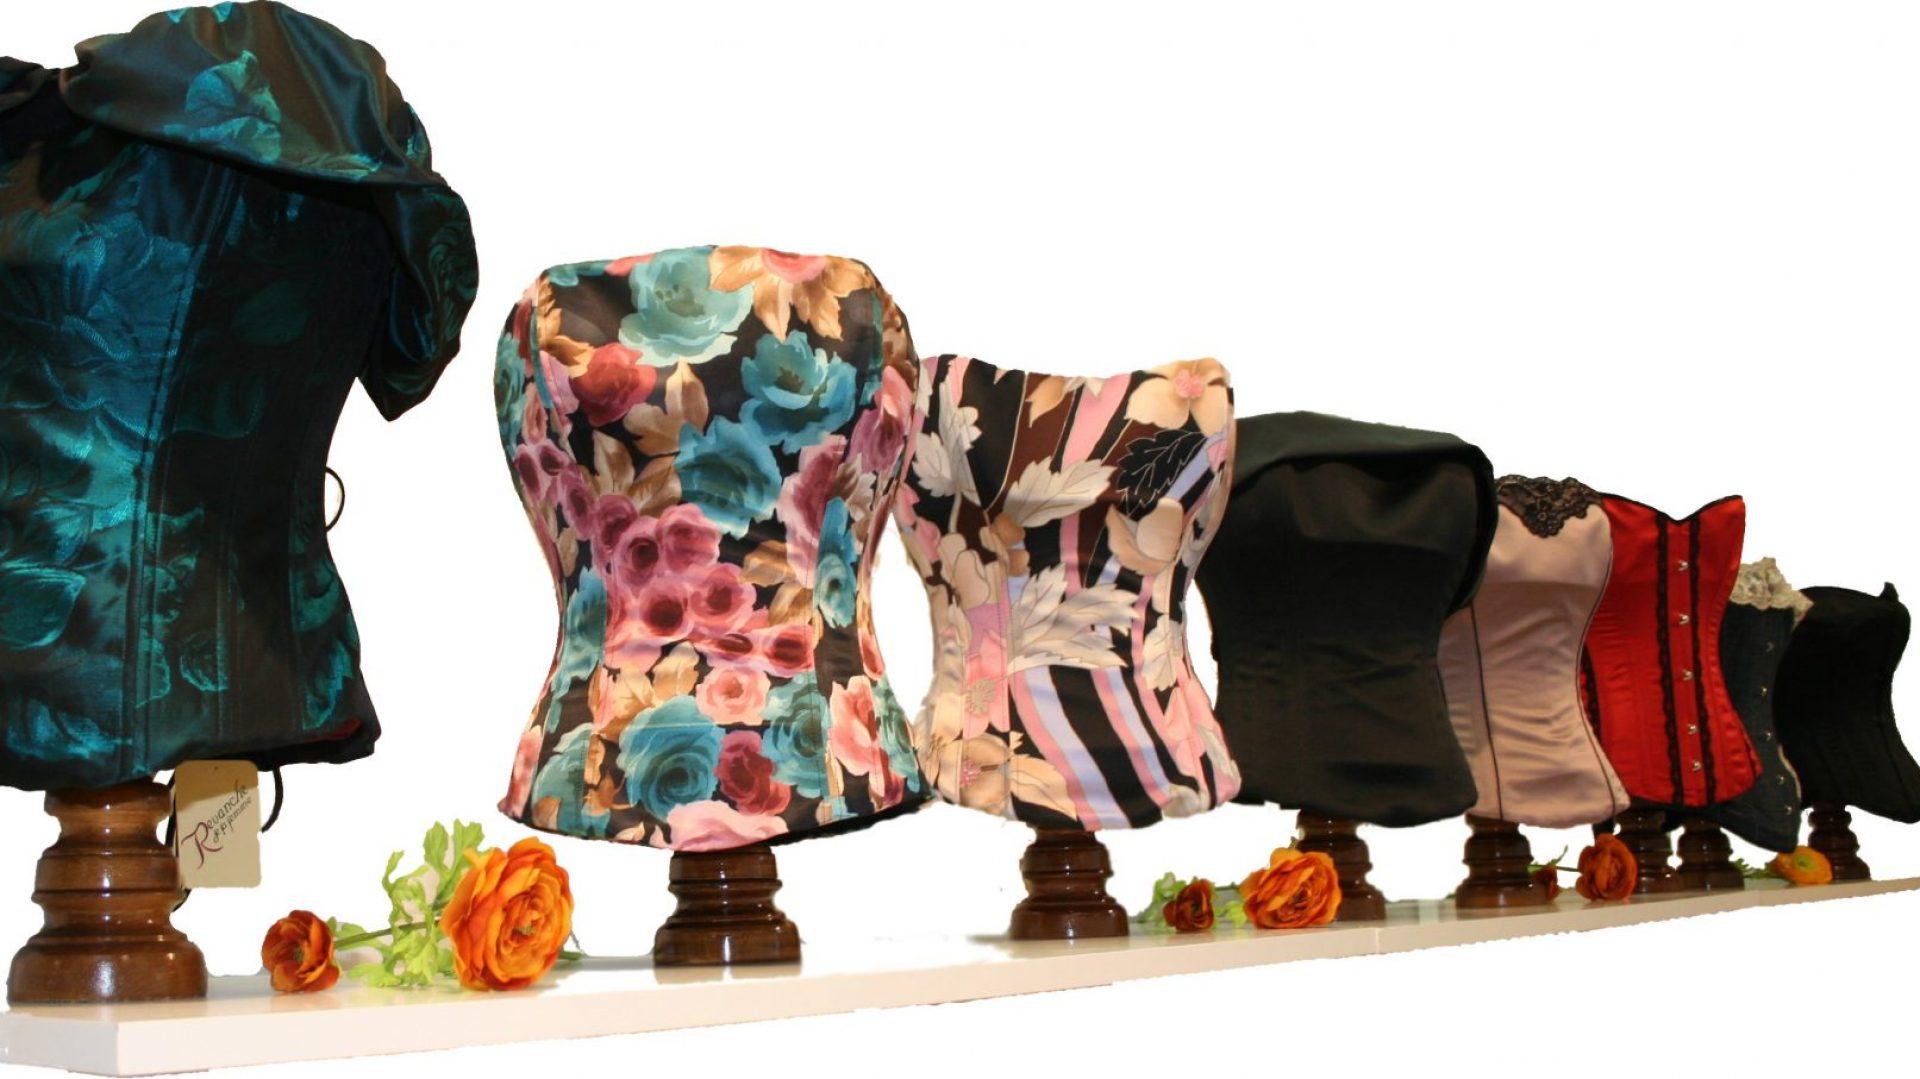 Das Schnür-Korsett bei sündige mode